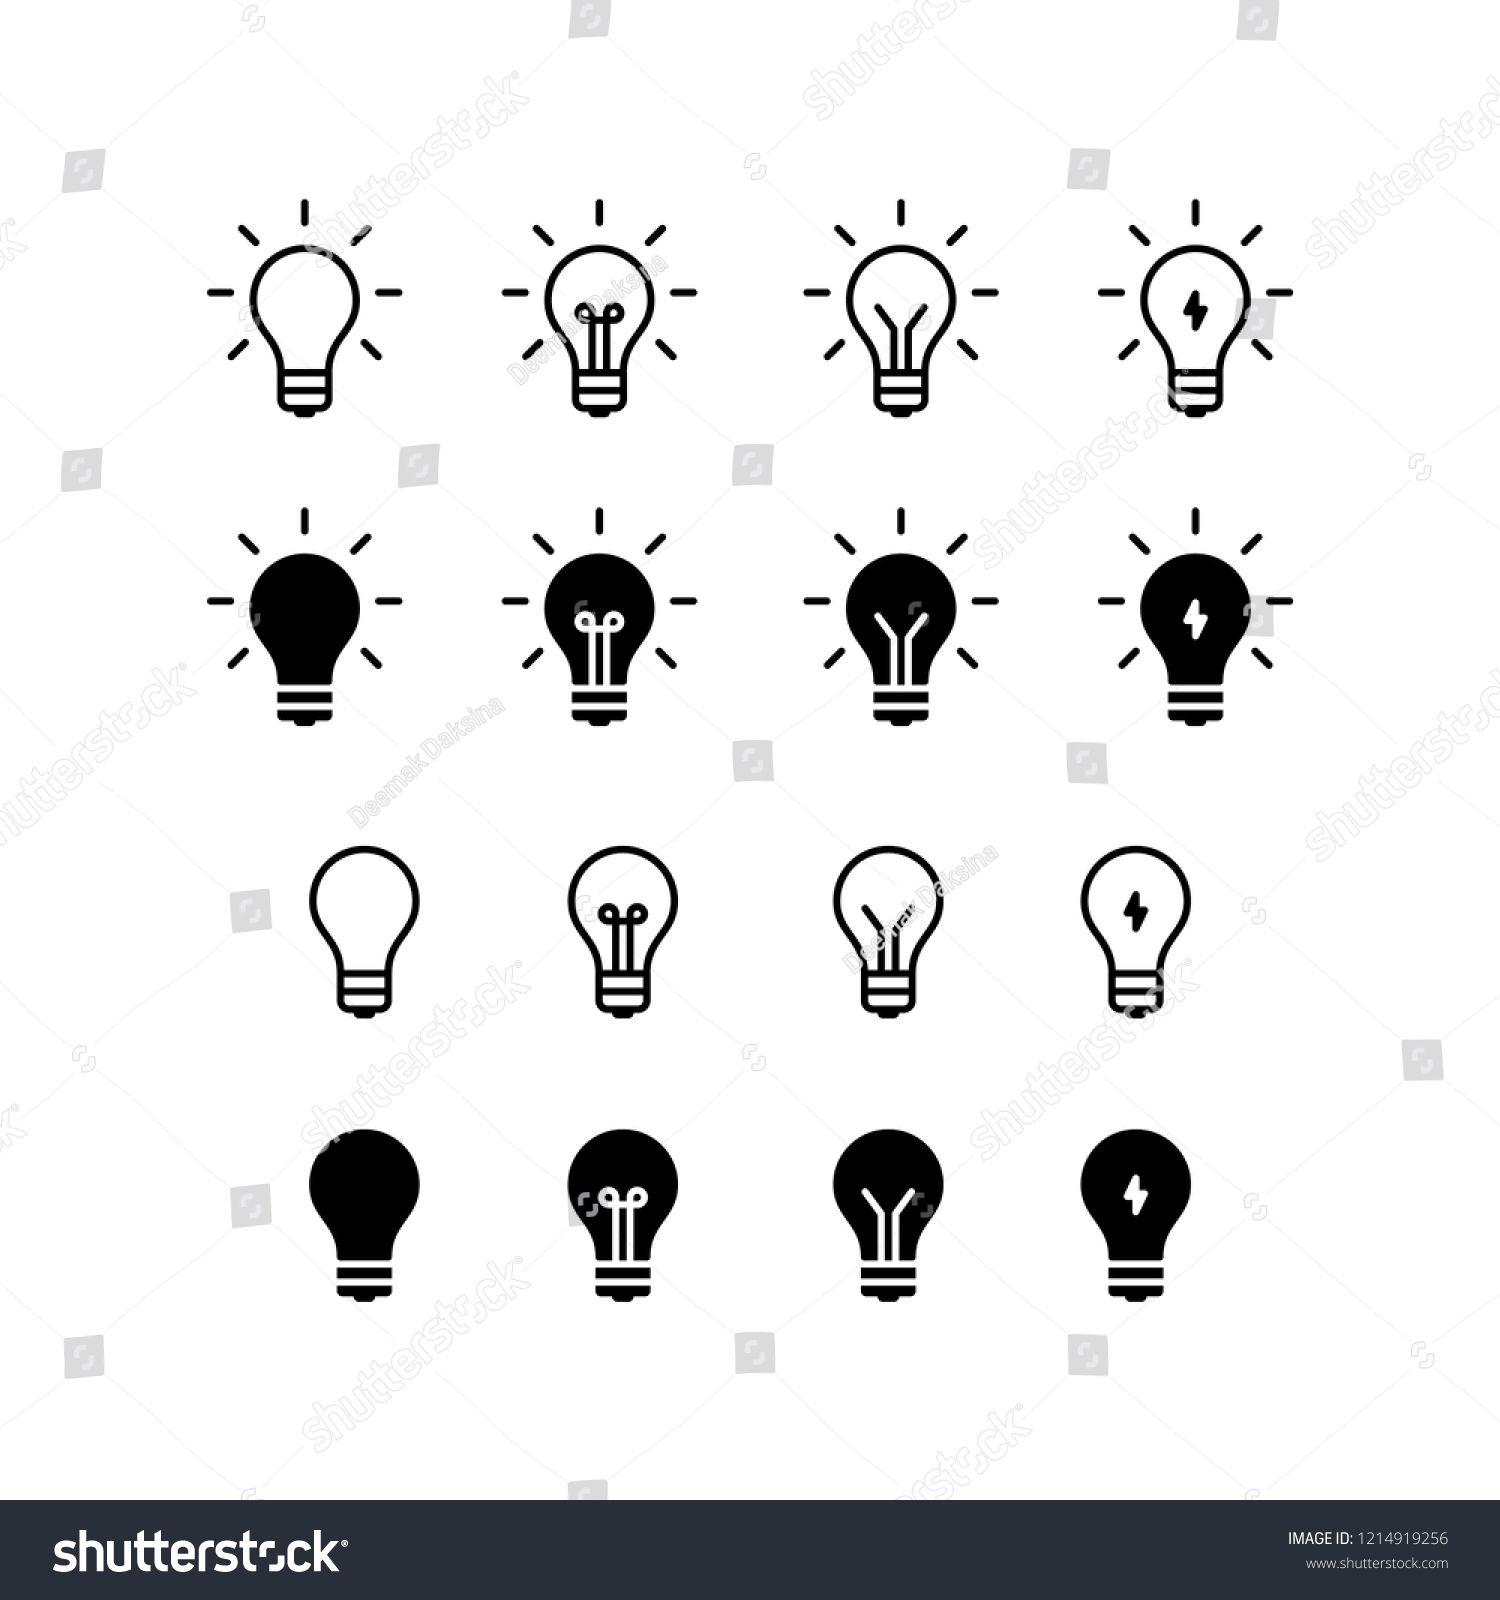 Idea Icon Design. idea, creativity, inspiration, light